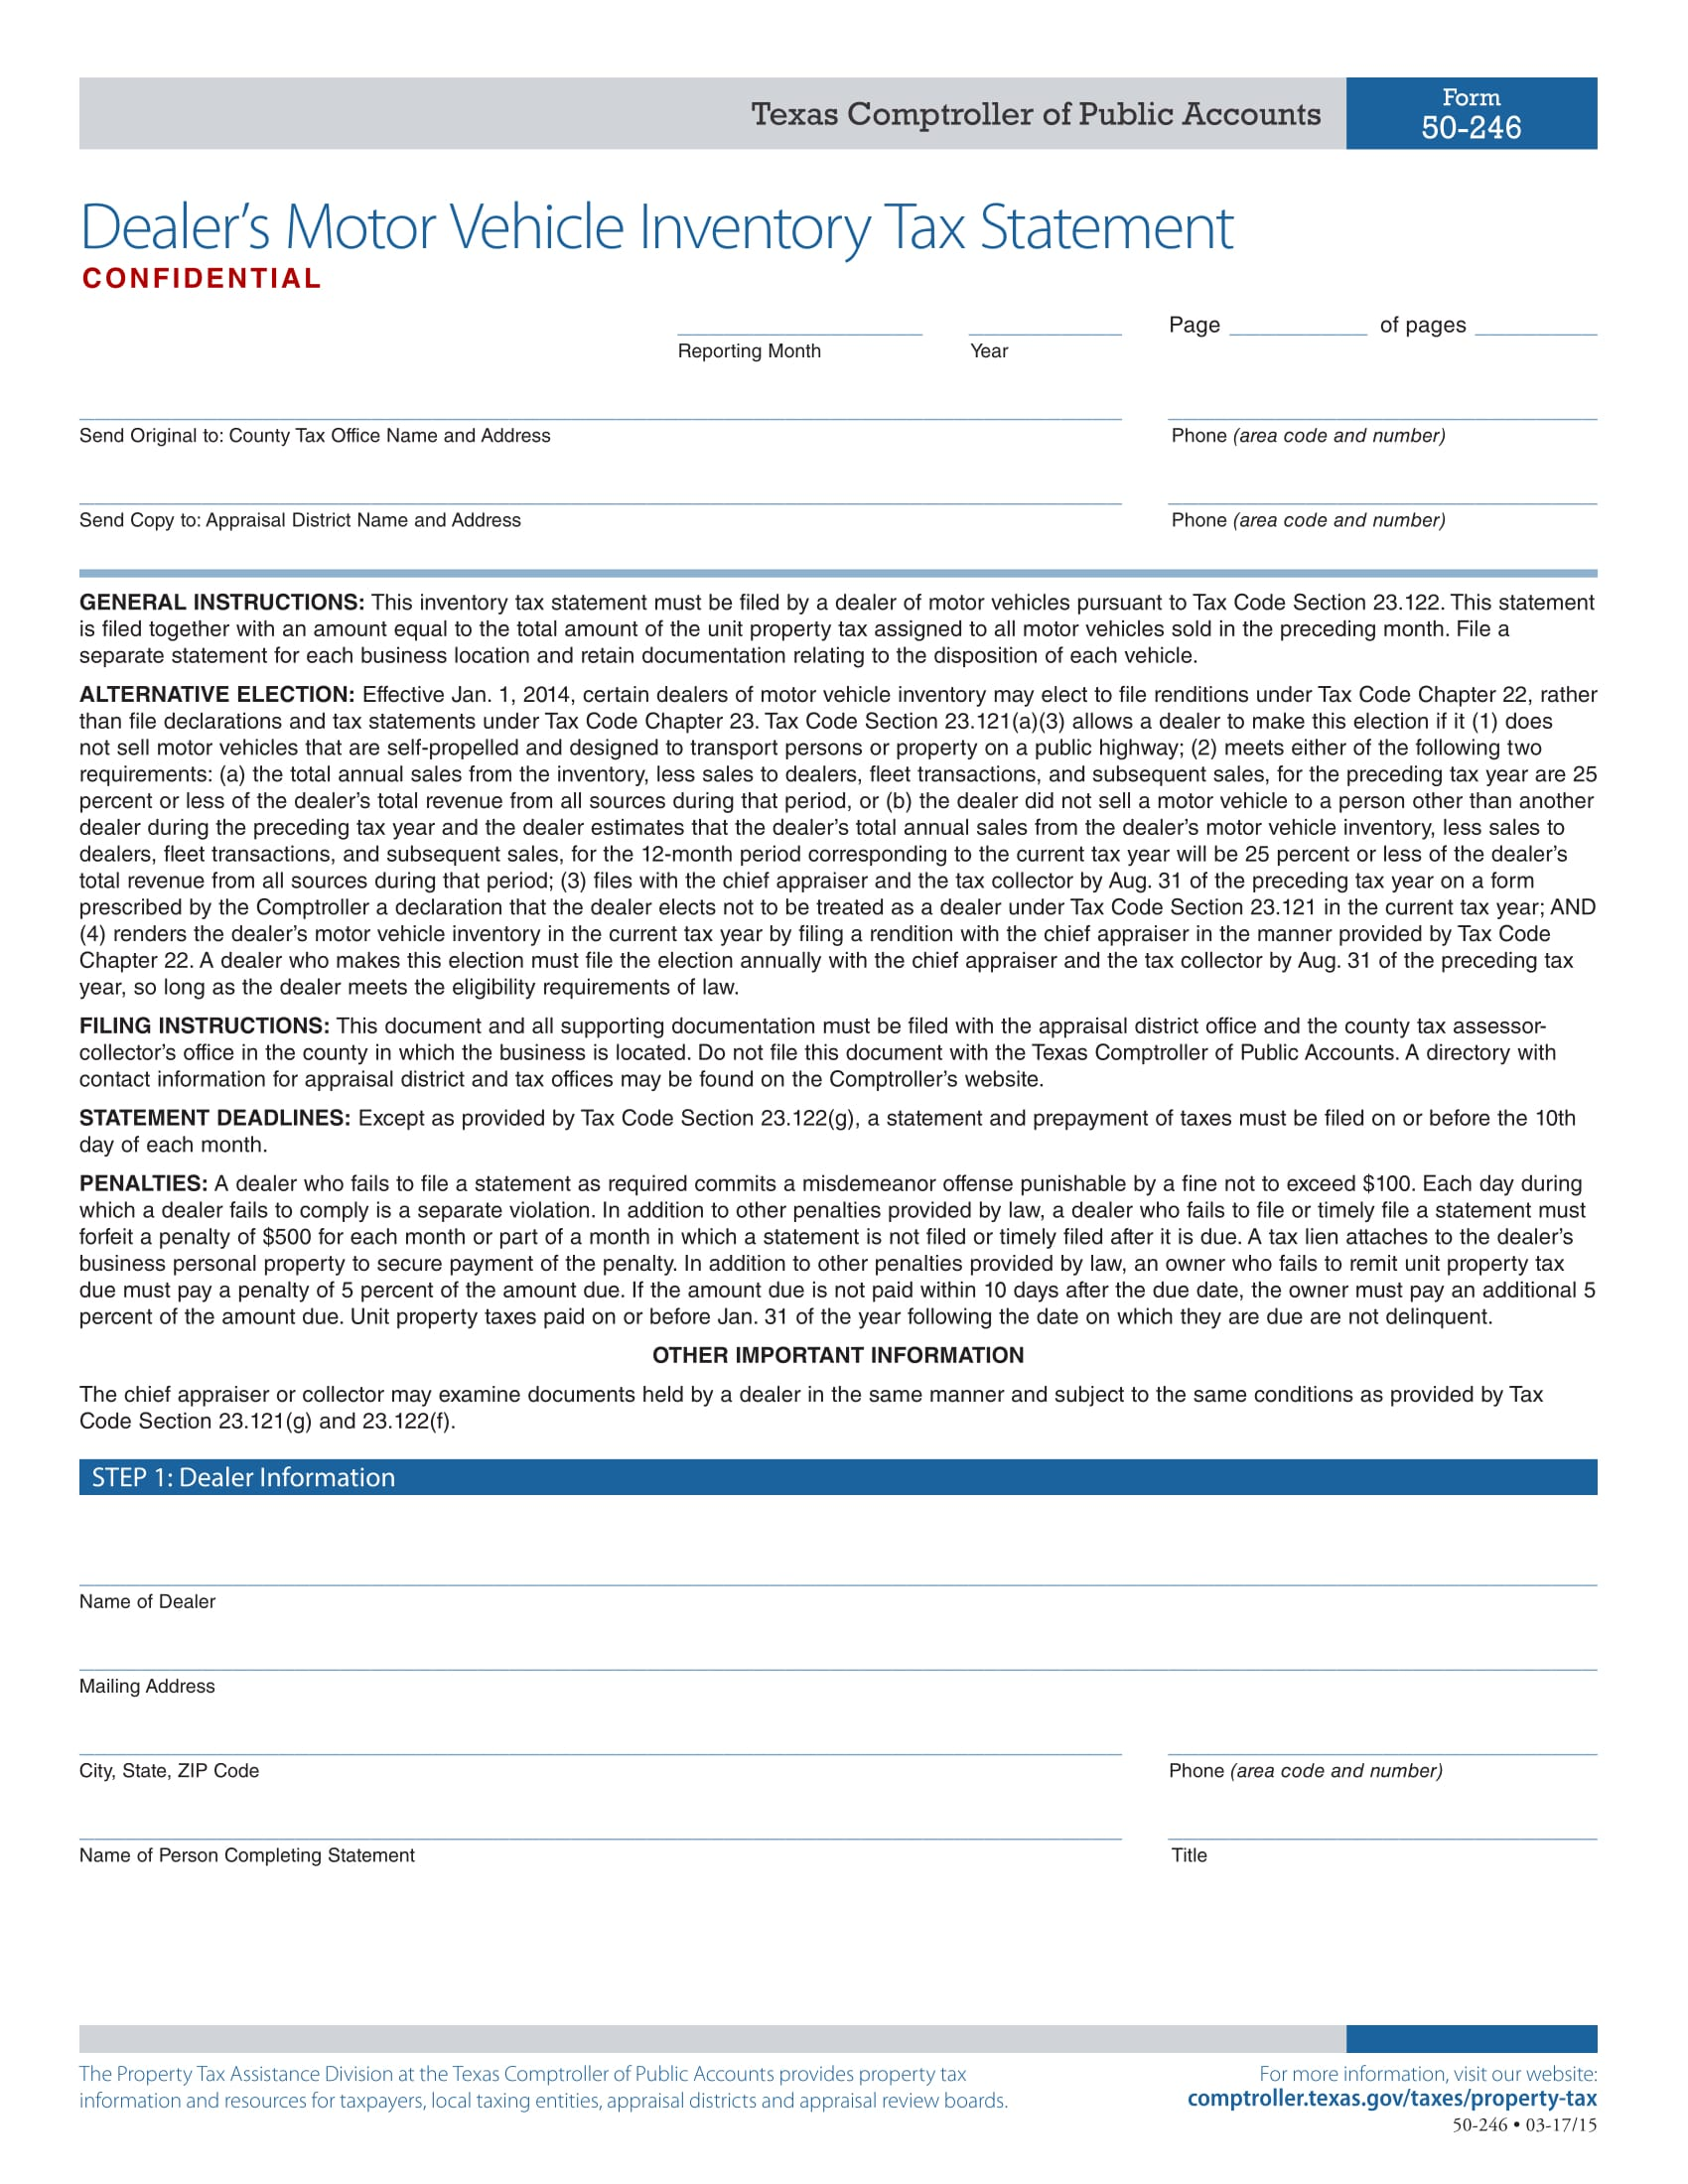 vehicle inventory tax statement 1